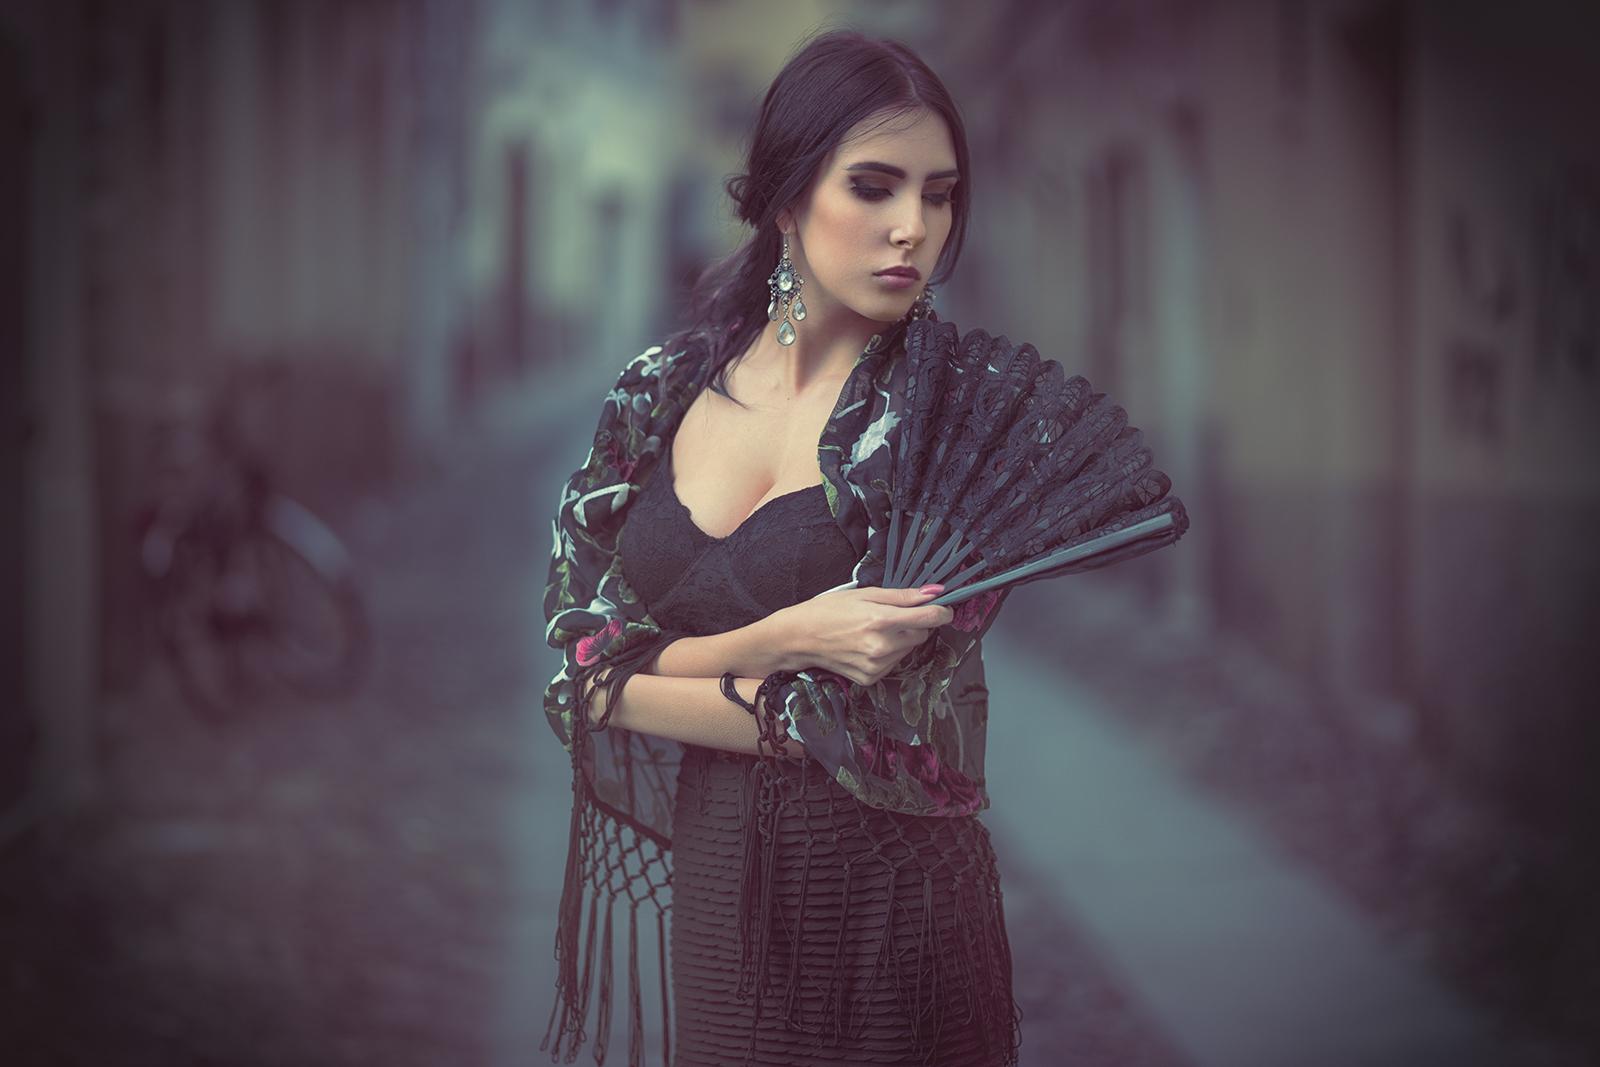 Magic spanish woman...